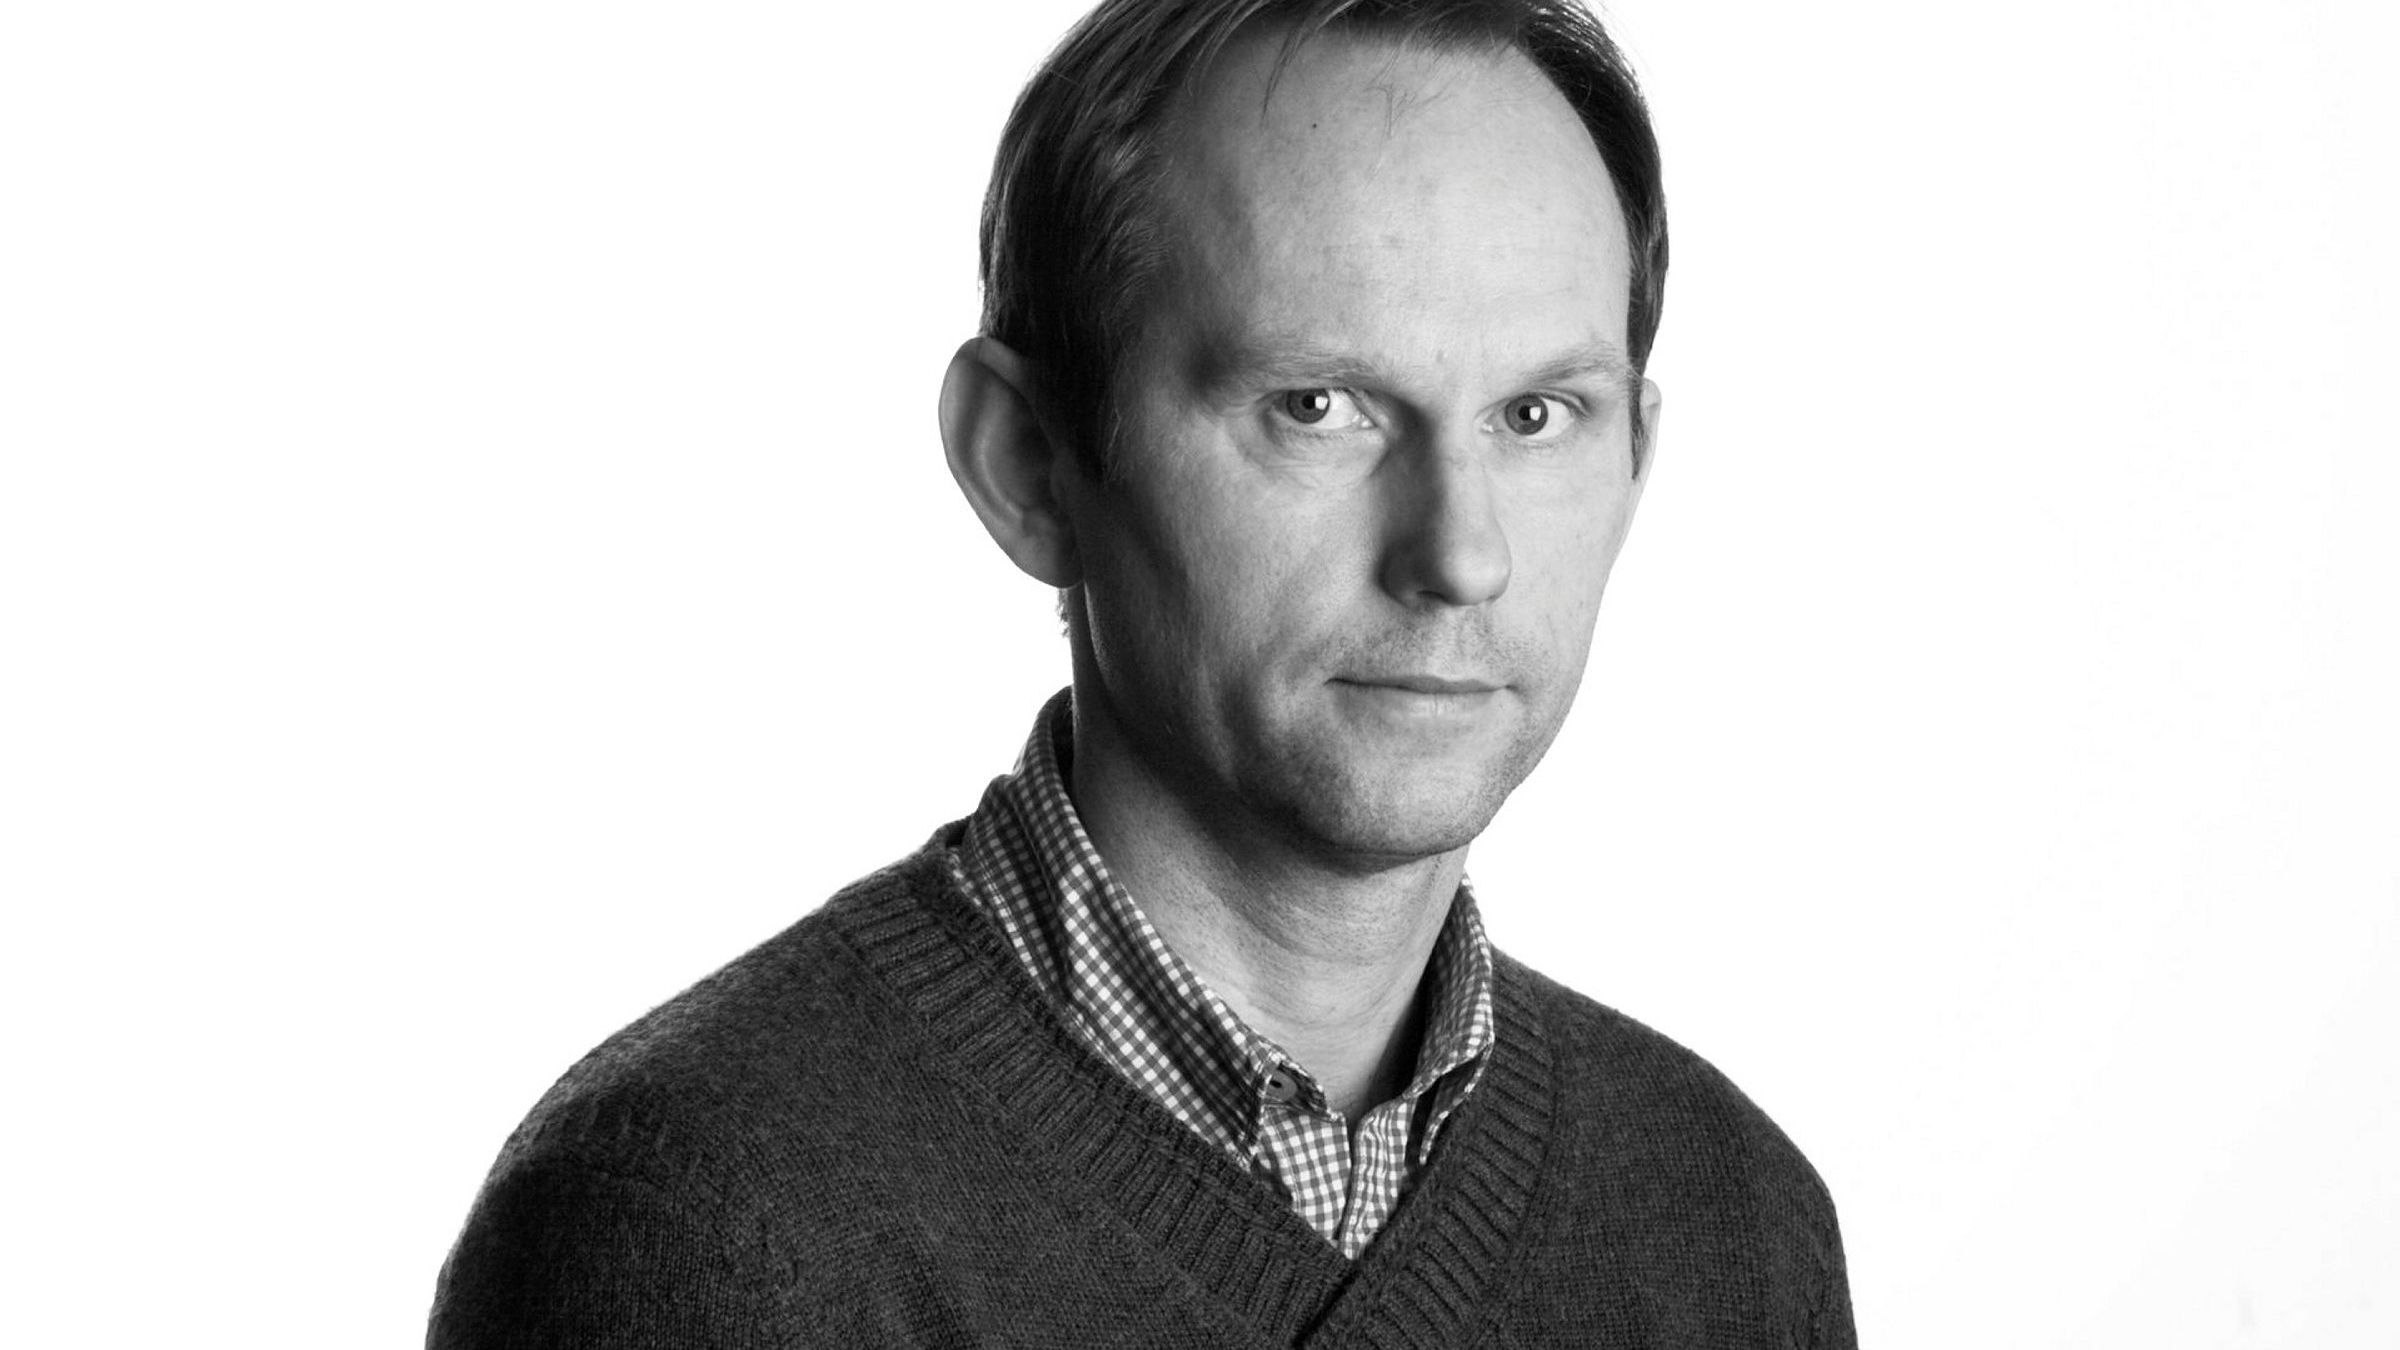 Bård Bjerkholt - Journalist i Dagens Næringsliv Byline - bylinebilde - vignett - vignettbilde - Vignettfoto - bylinefoto Foto: Mona Pedersen